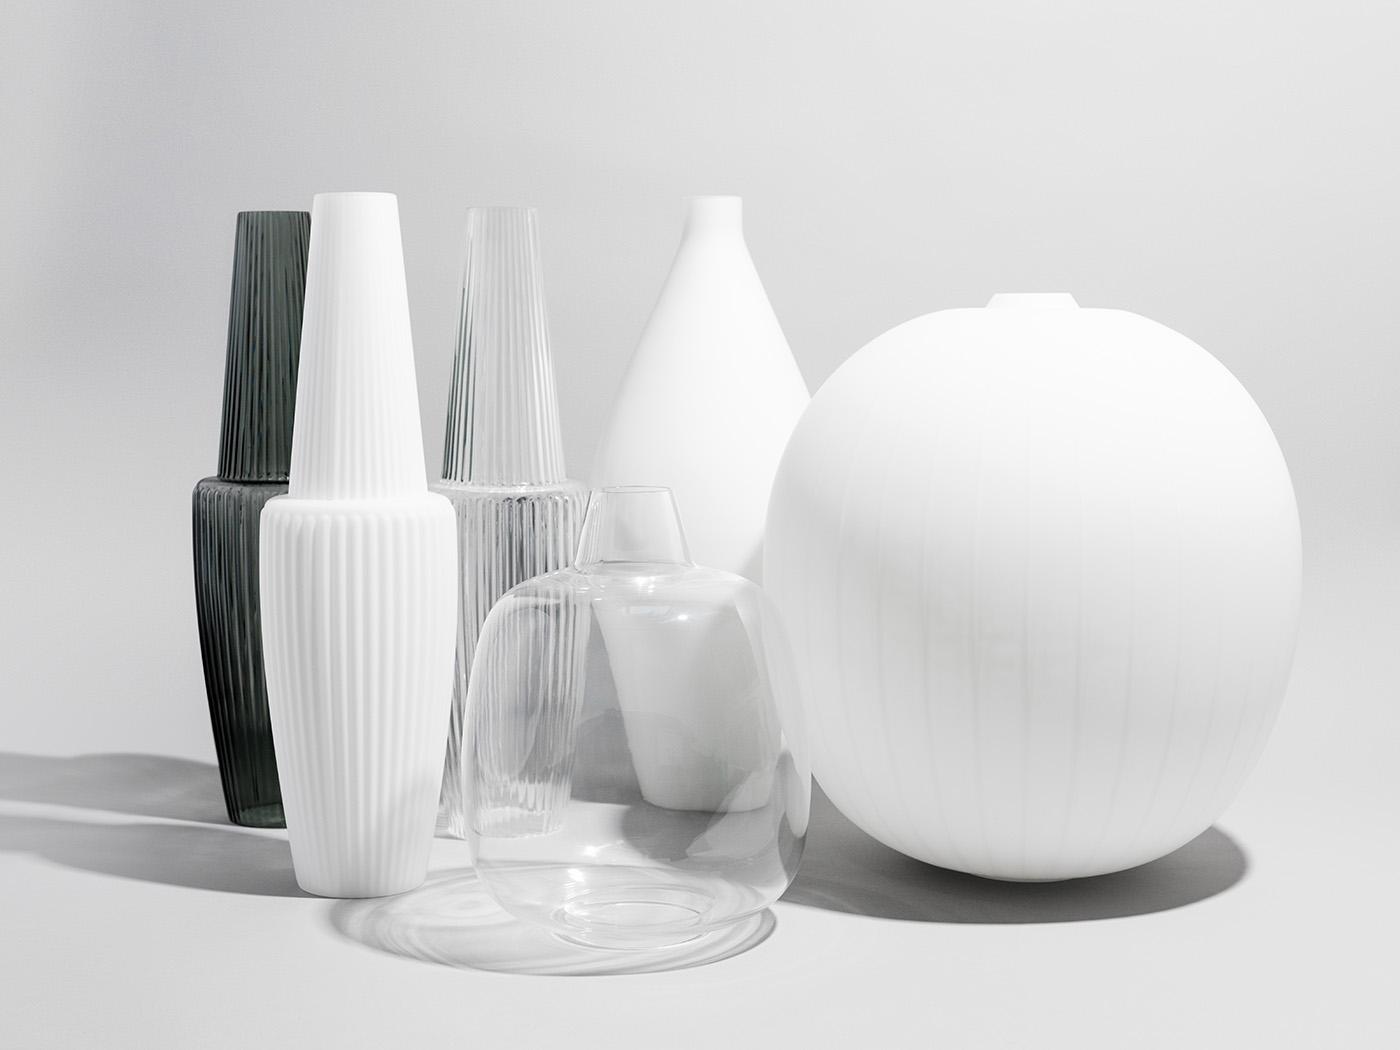 Prototypen Gangkofner Serie für mawa design